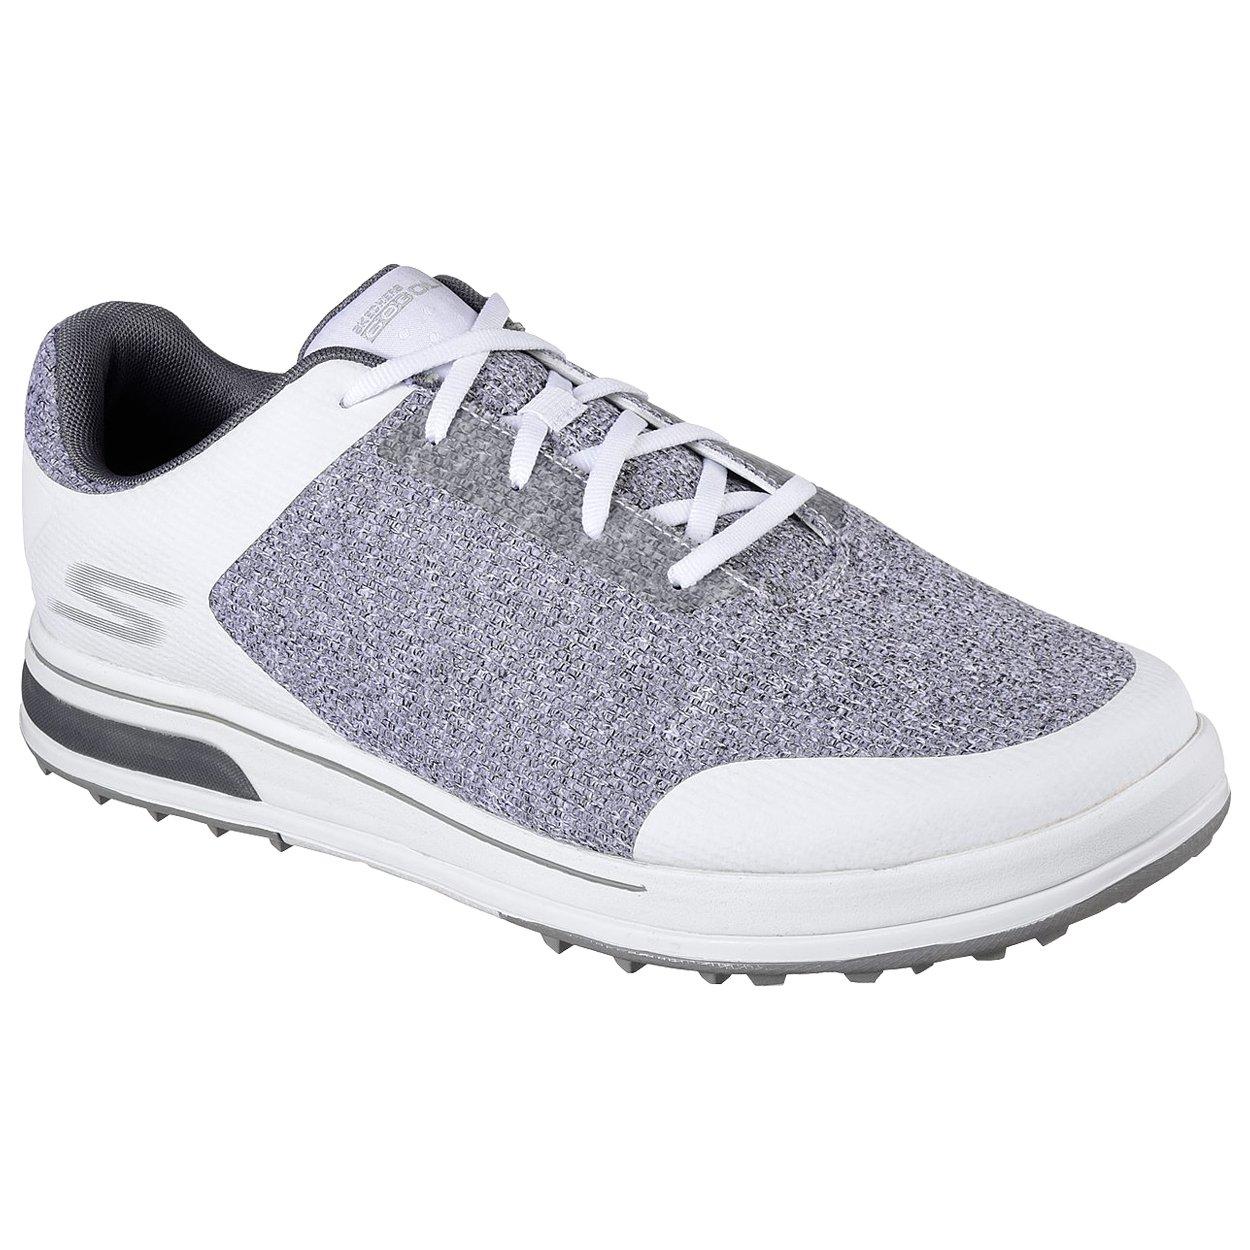 Skechers Men's Go Golf Drive 3 Golf Shoe,White/Gray,9 M US